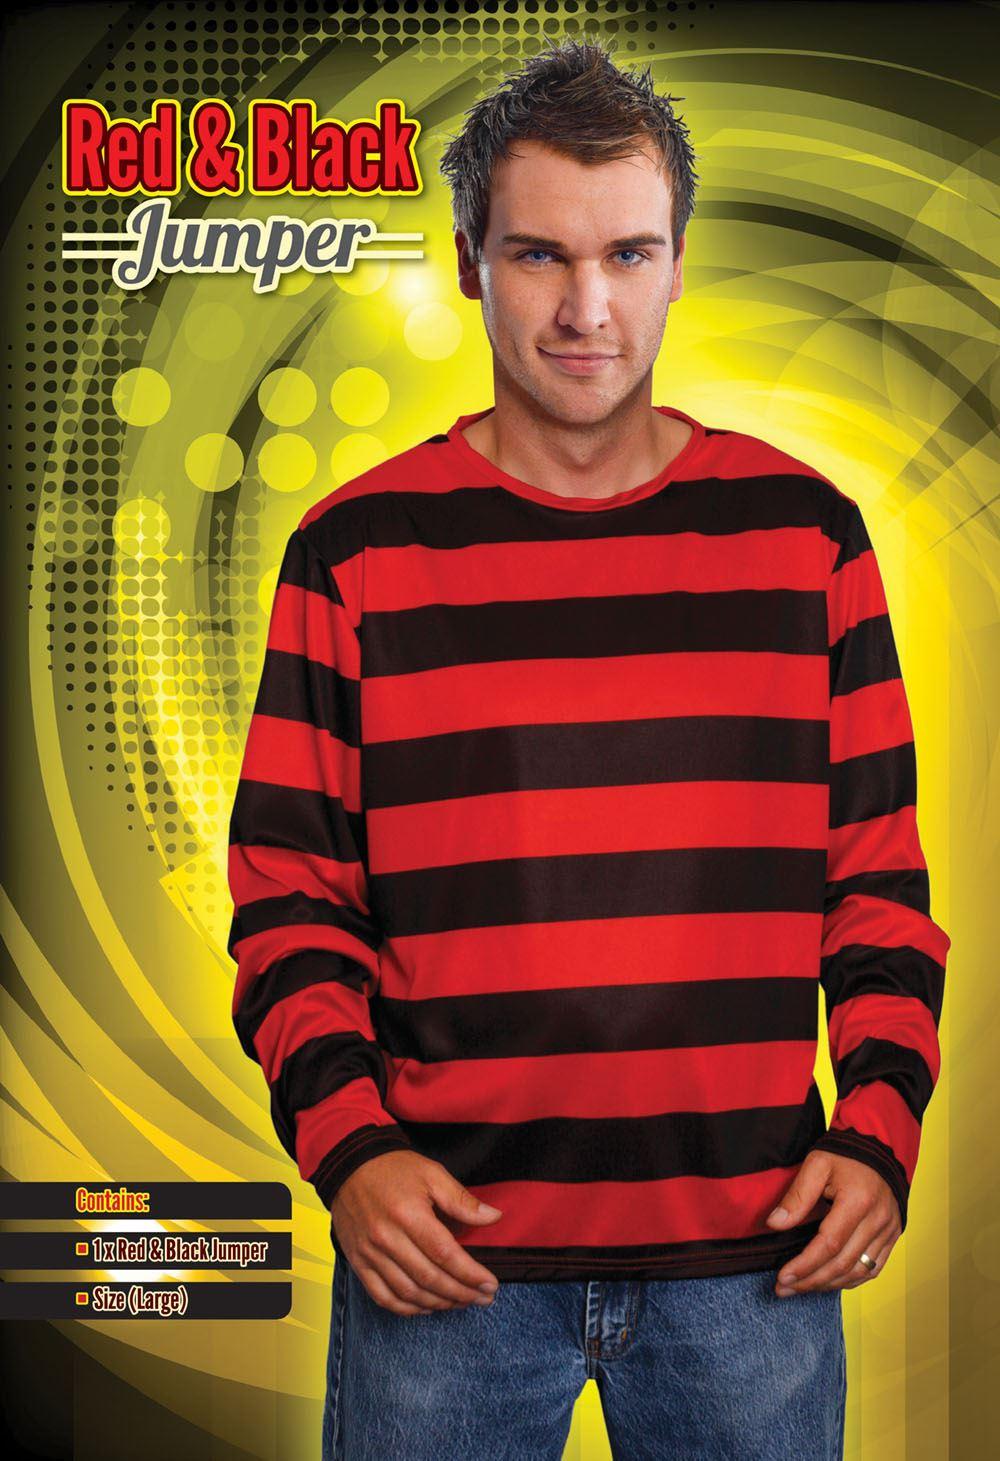 Mens Adult Dennis the Menace Red and Black Striped Jumper Fancy Dress  Costume BN bd16860db